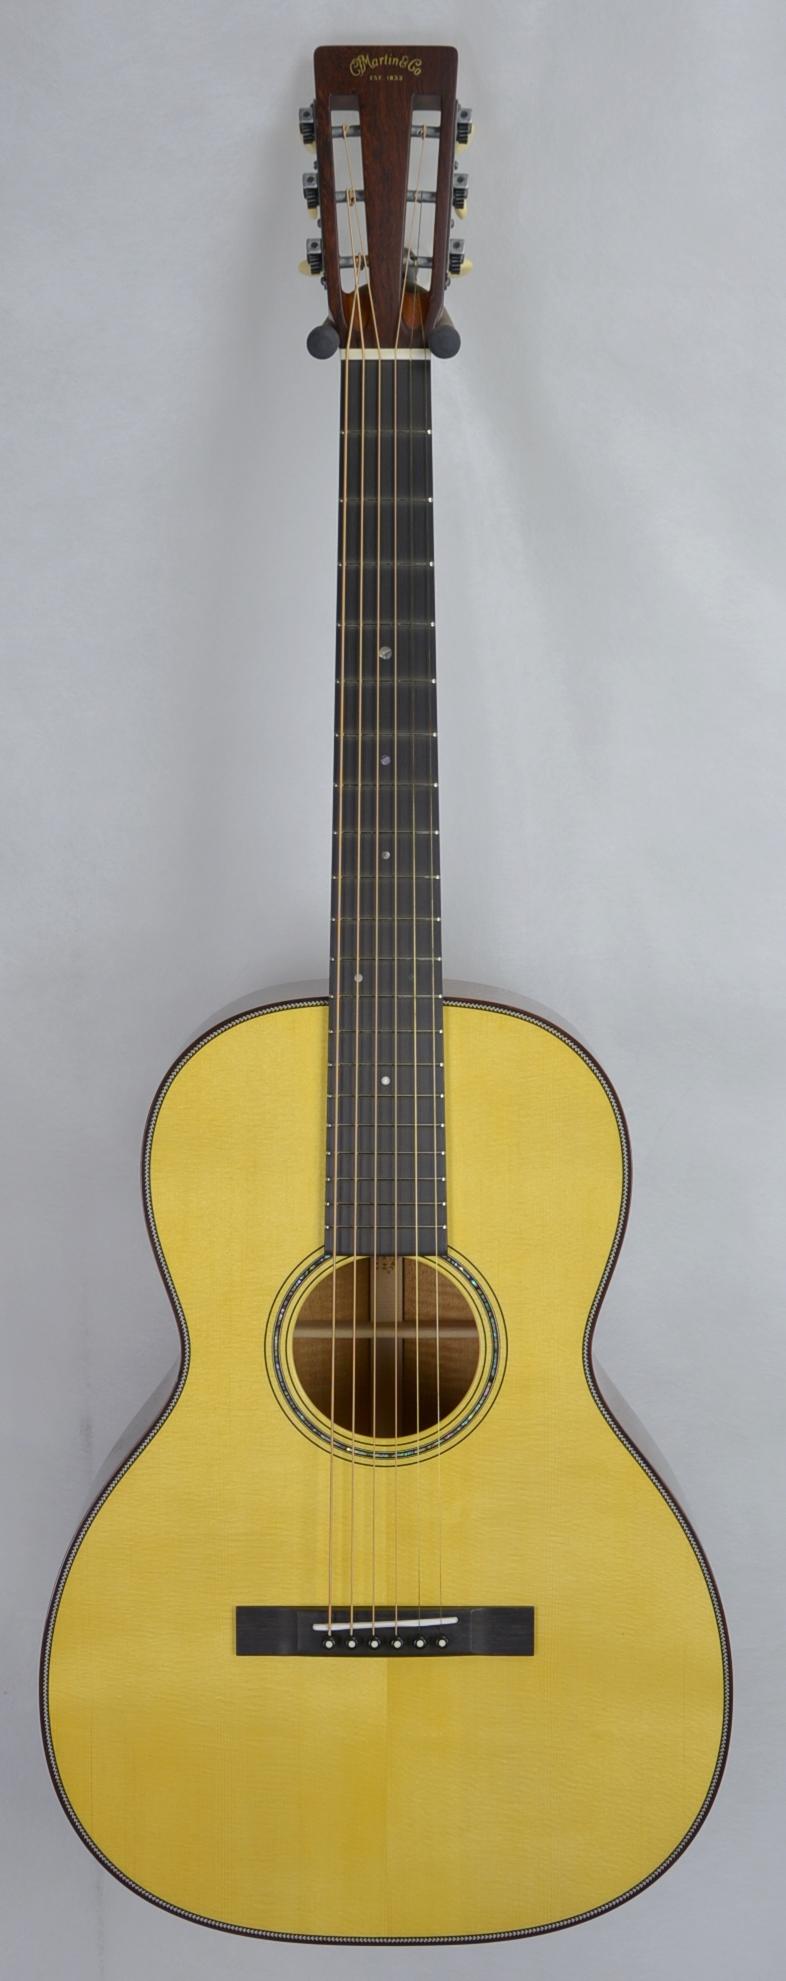 Q-2396024 S-1827233 00-12 Fiddleback Alpine Fine HB (2).JPG